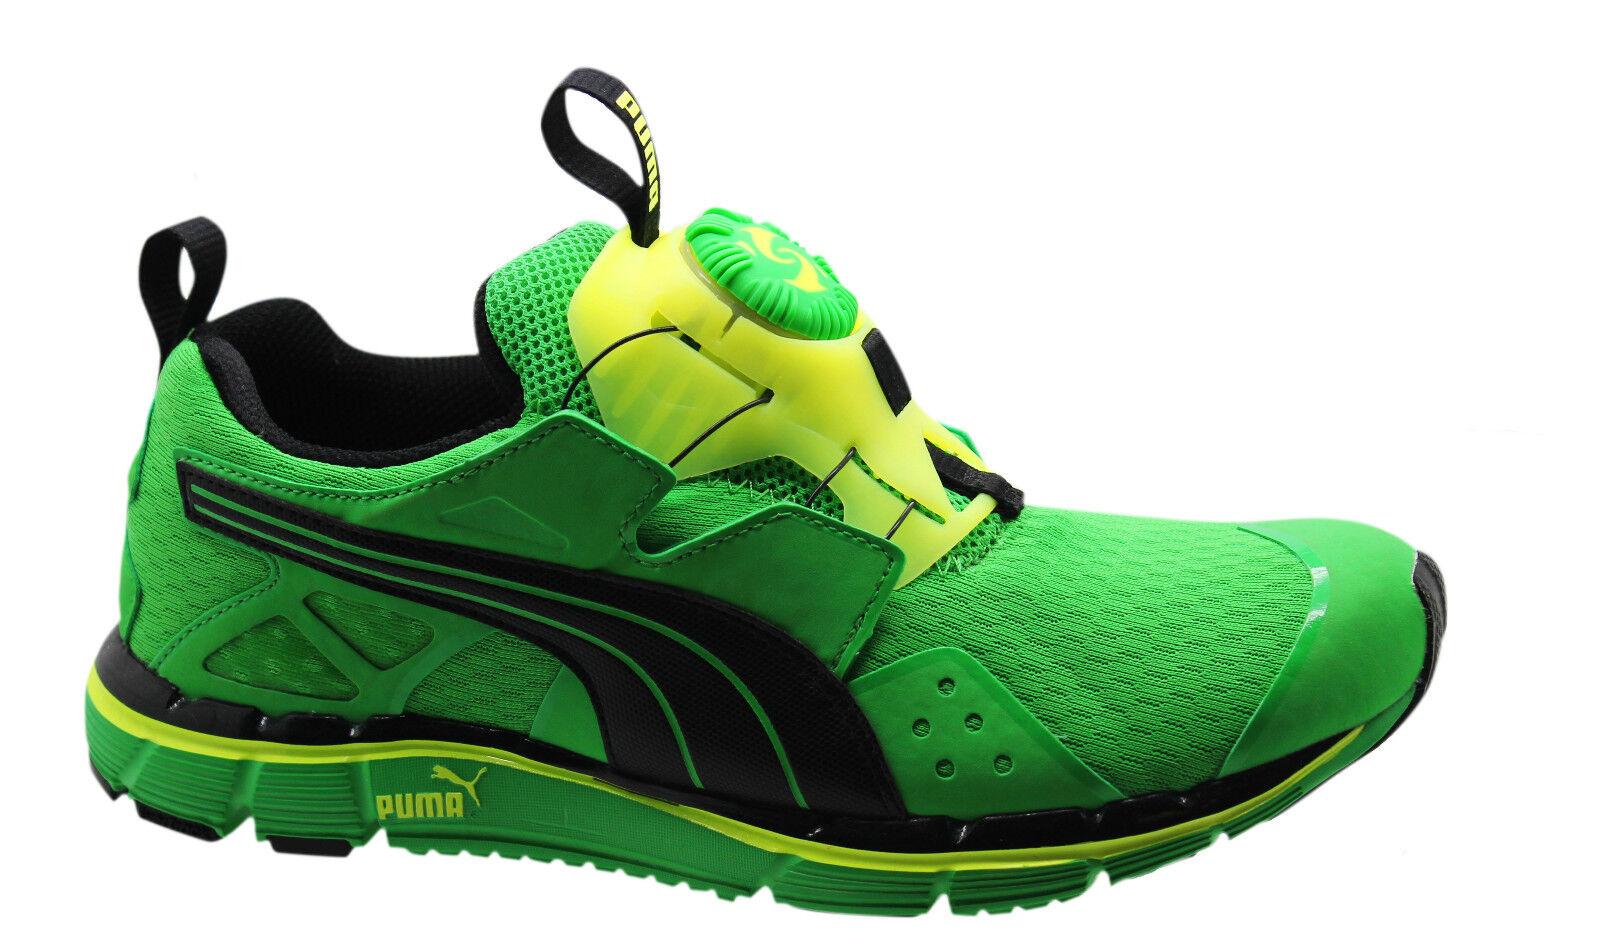 Puma Disc Ltwt 2.0 NM Lightweight Mens Trainers Green Slip On 187161 03 P2